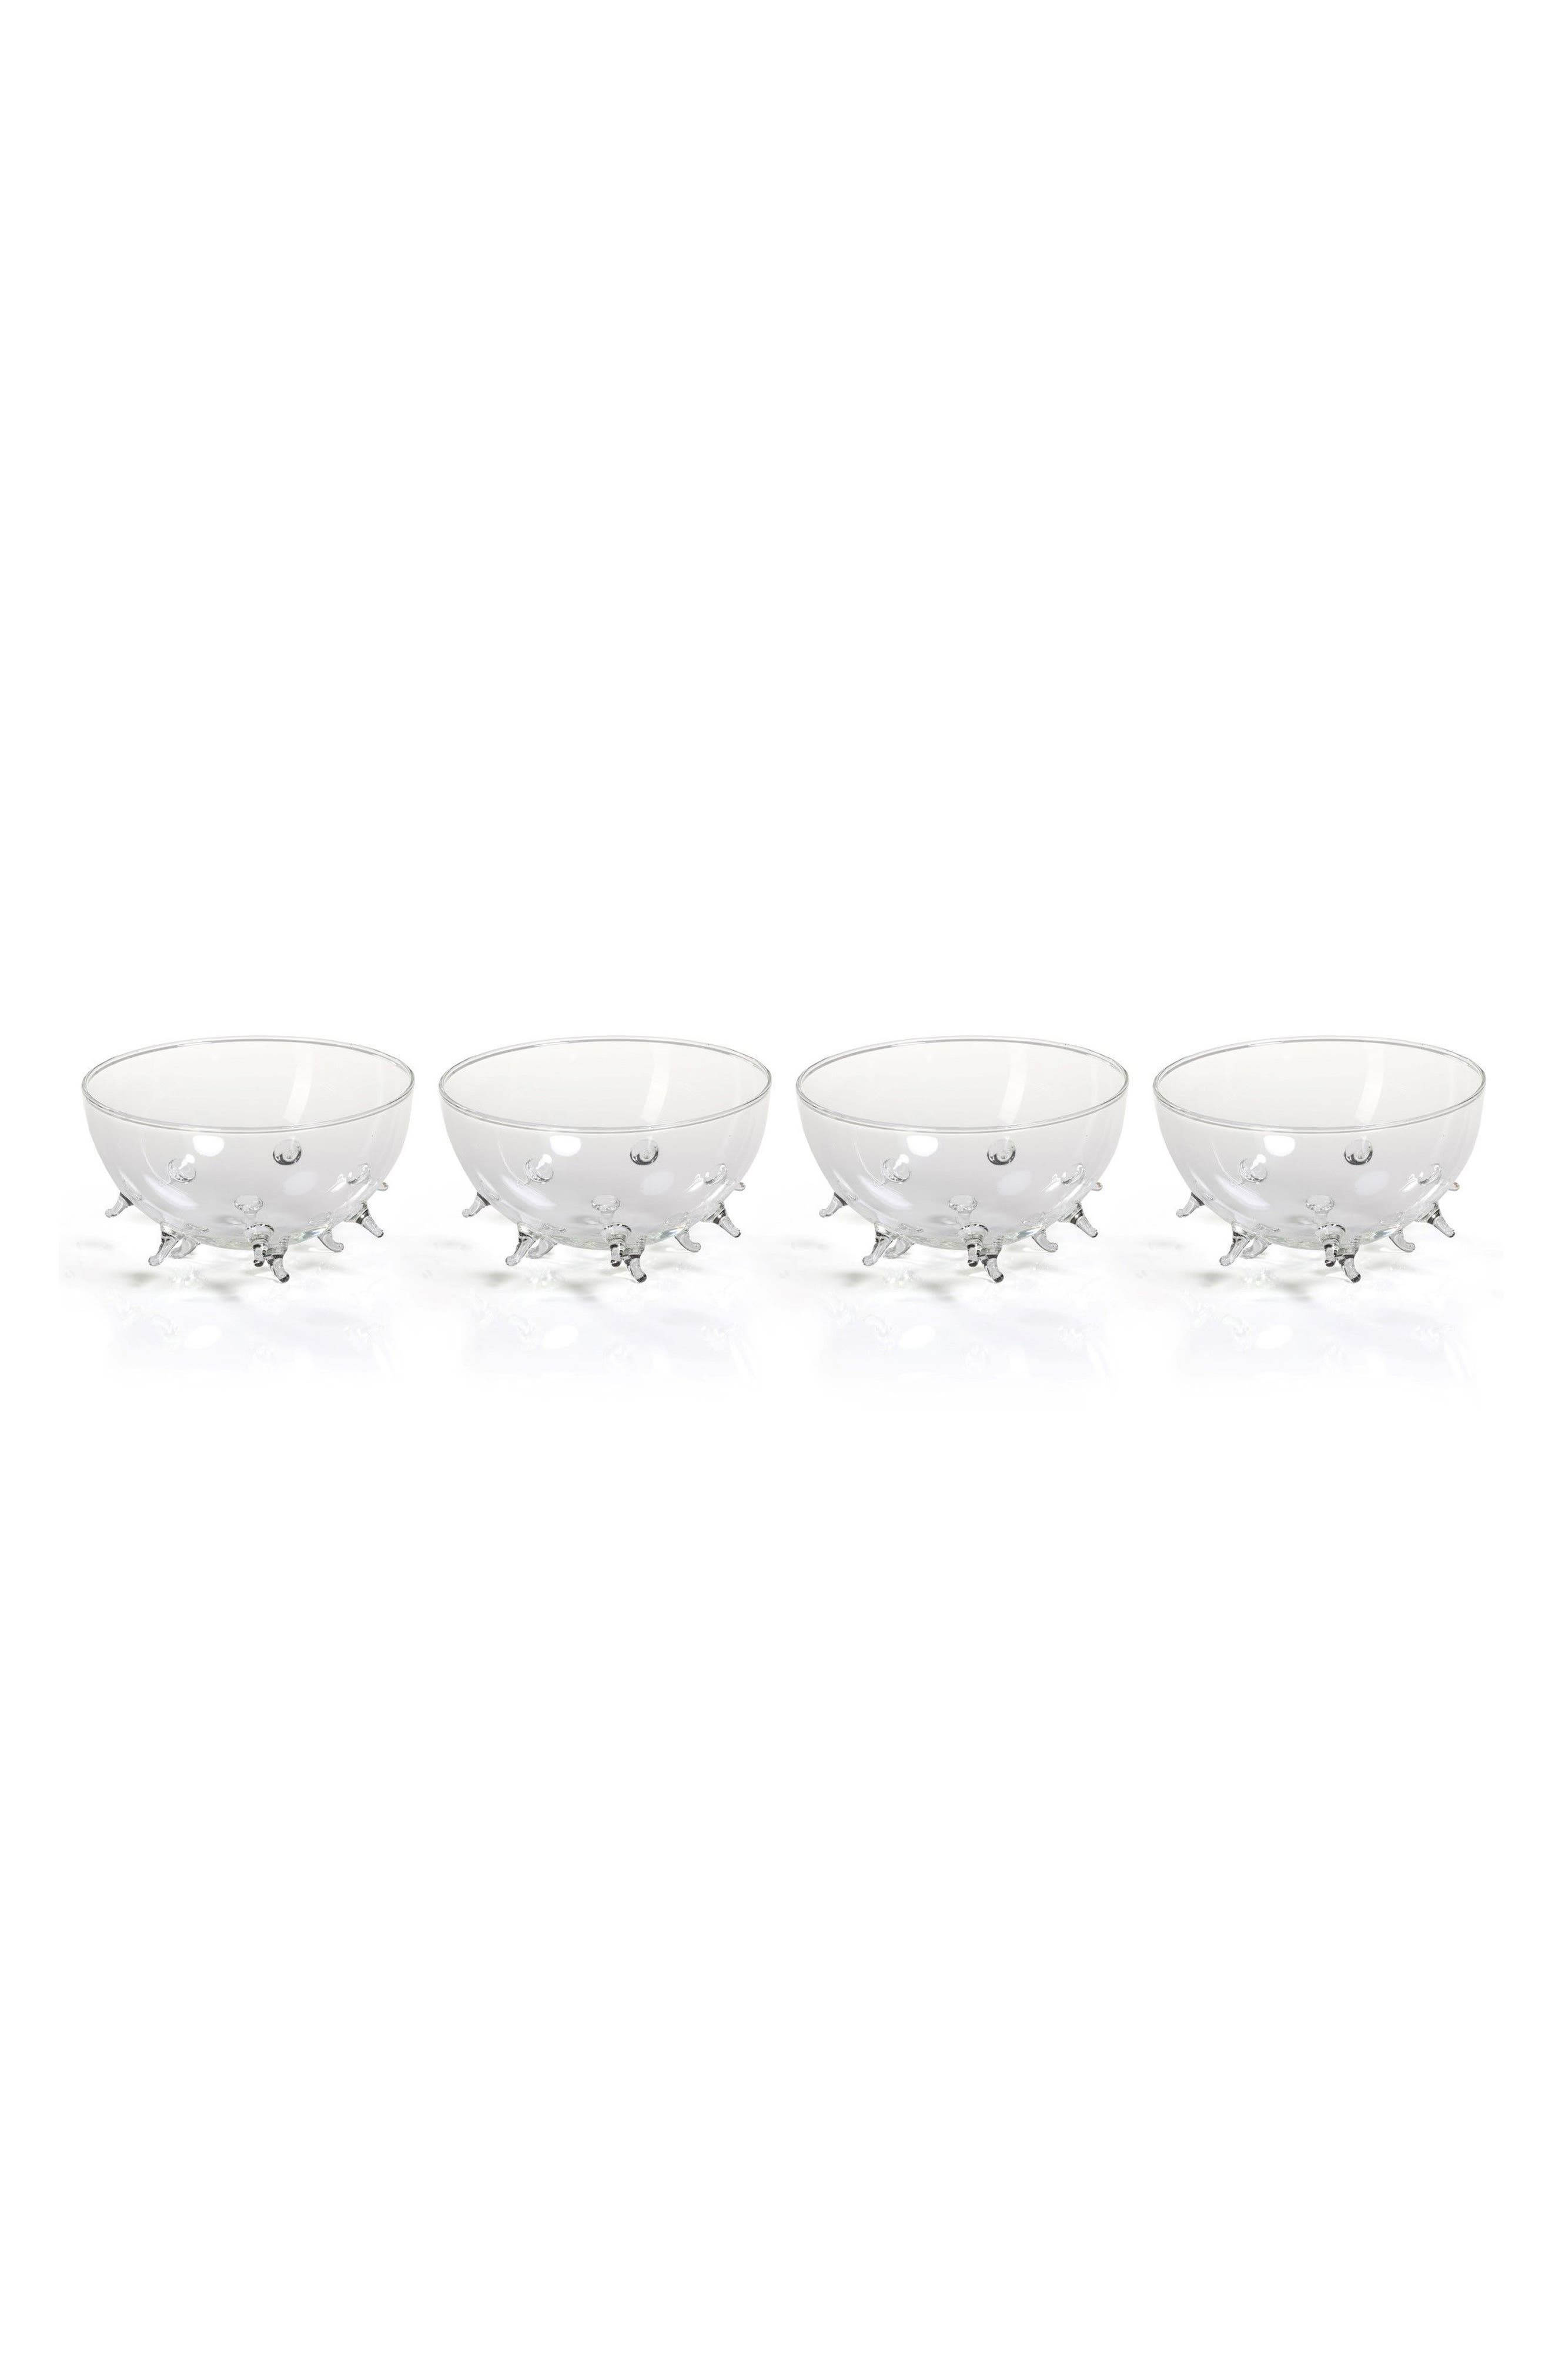 Main Image - Zodax Suri Set of 4 Bowls